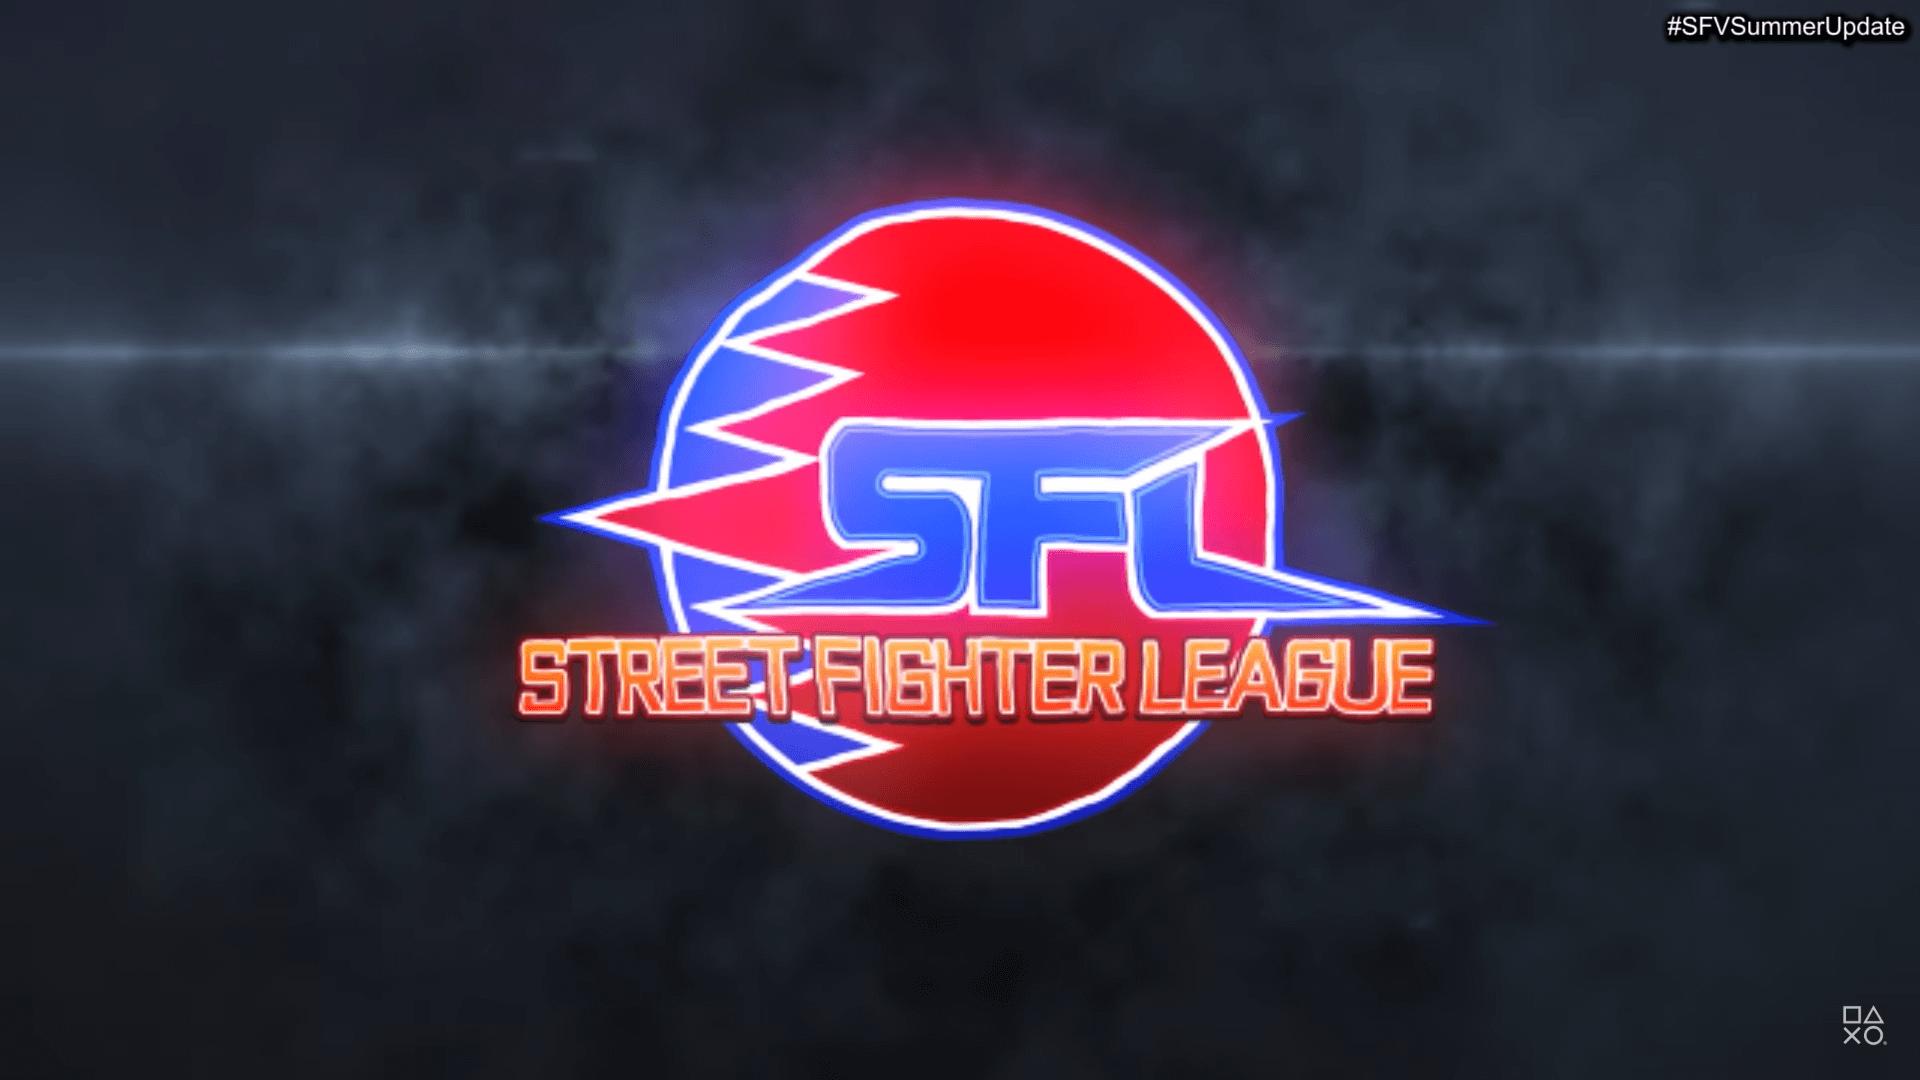 Capcom Resumes Street Fighter League Season 3